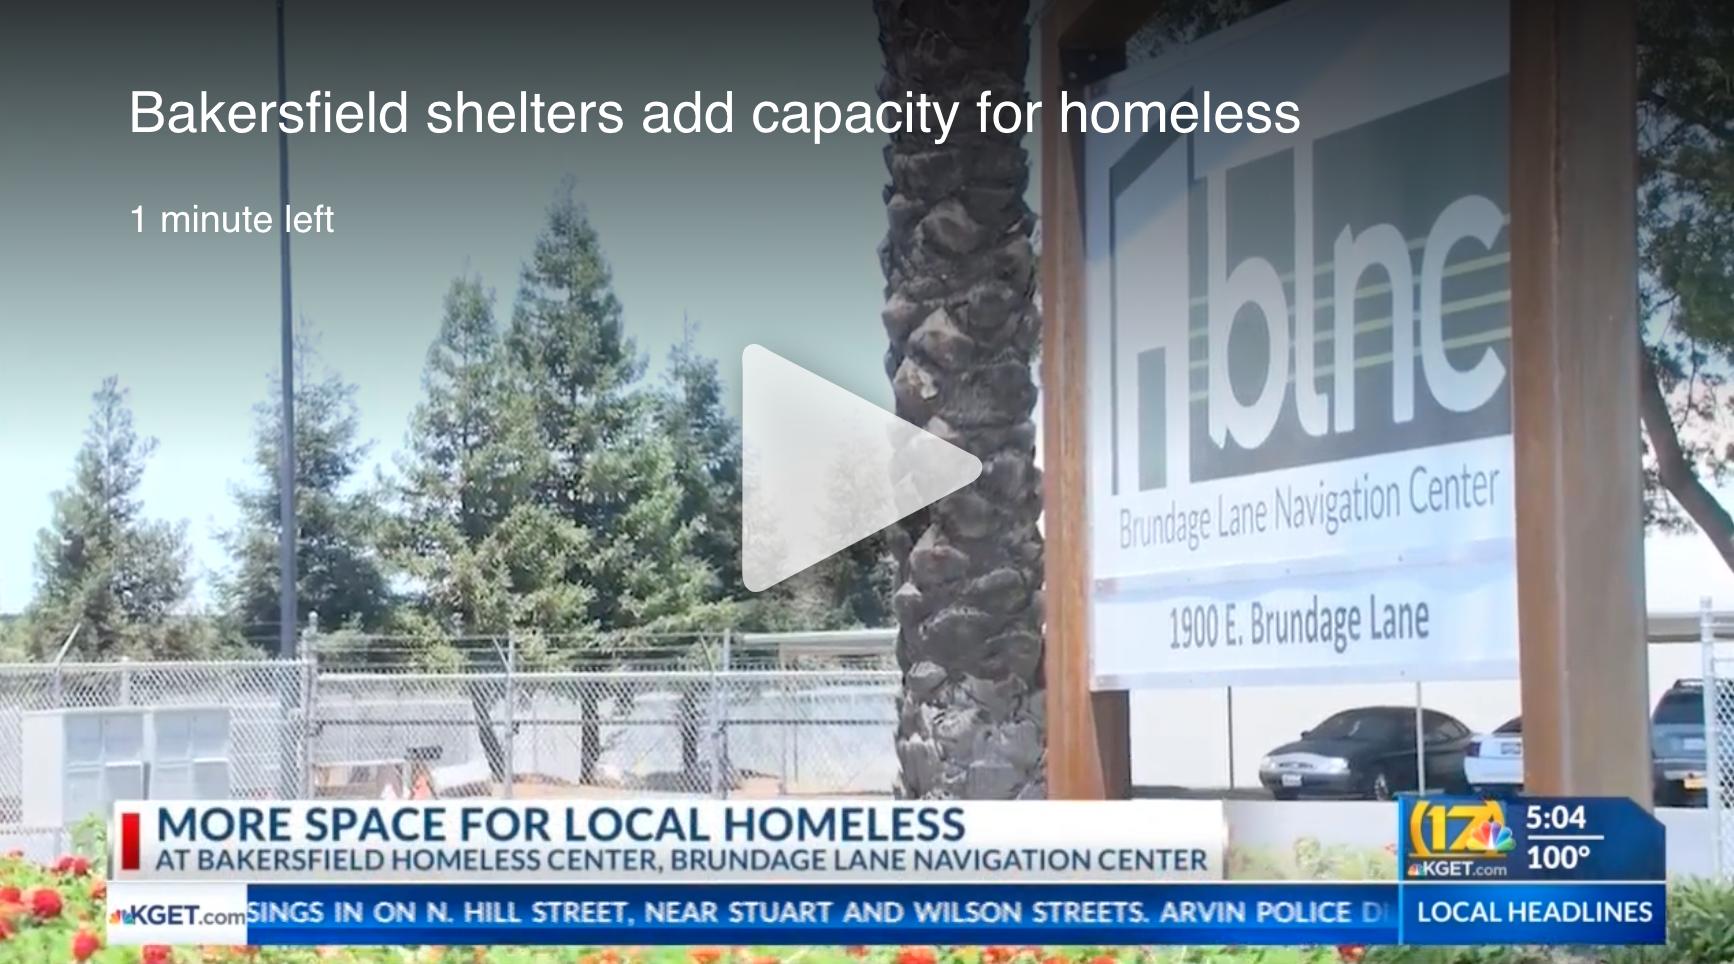 Brundage Lane Navigation Center adds more space for local homeless population